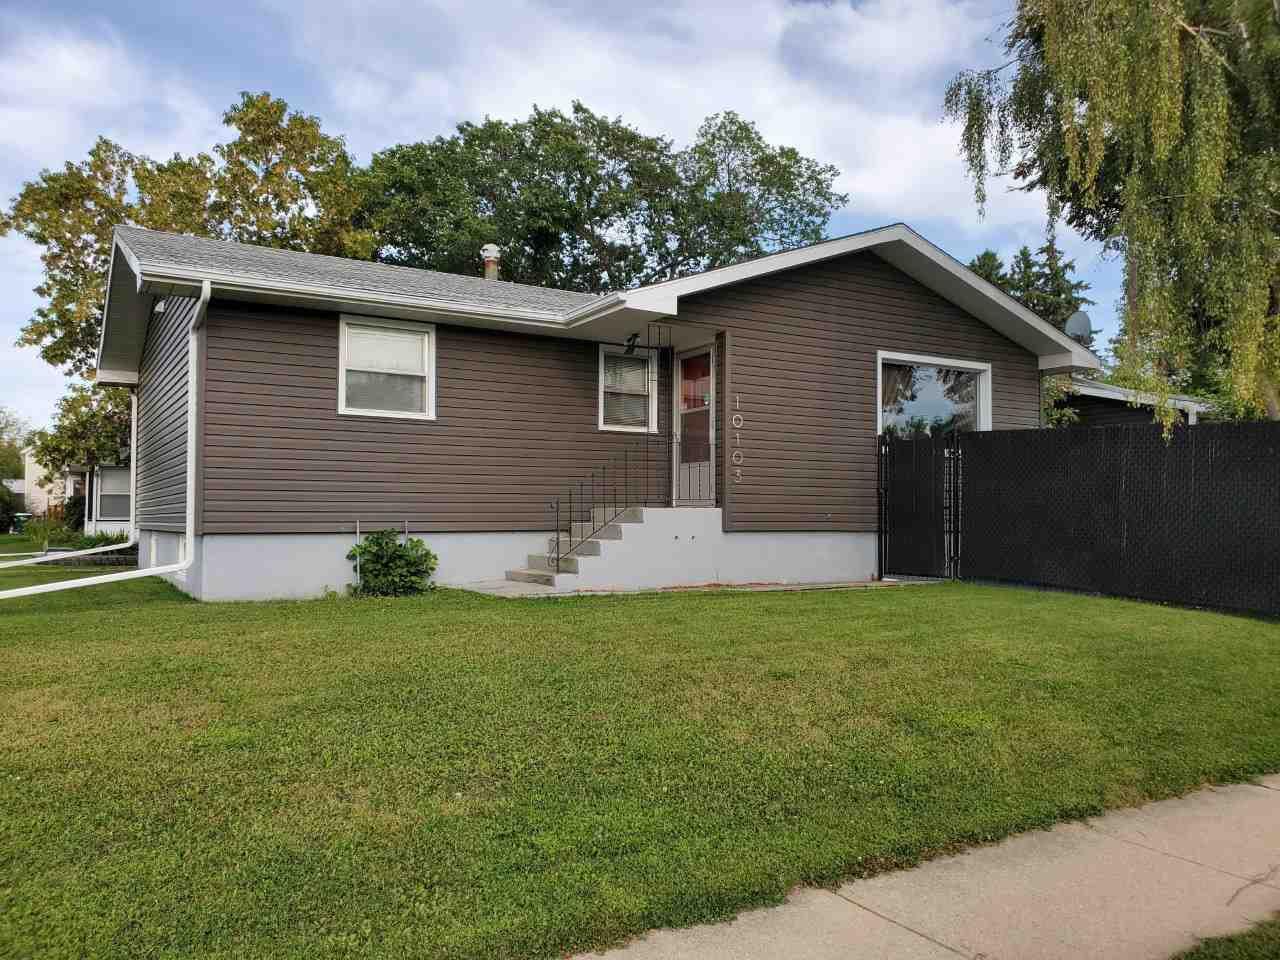 Main Photo: 10103 106 Street: Westlock House for sale : MLS®# E4212275